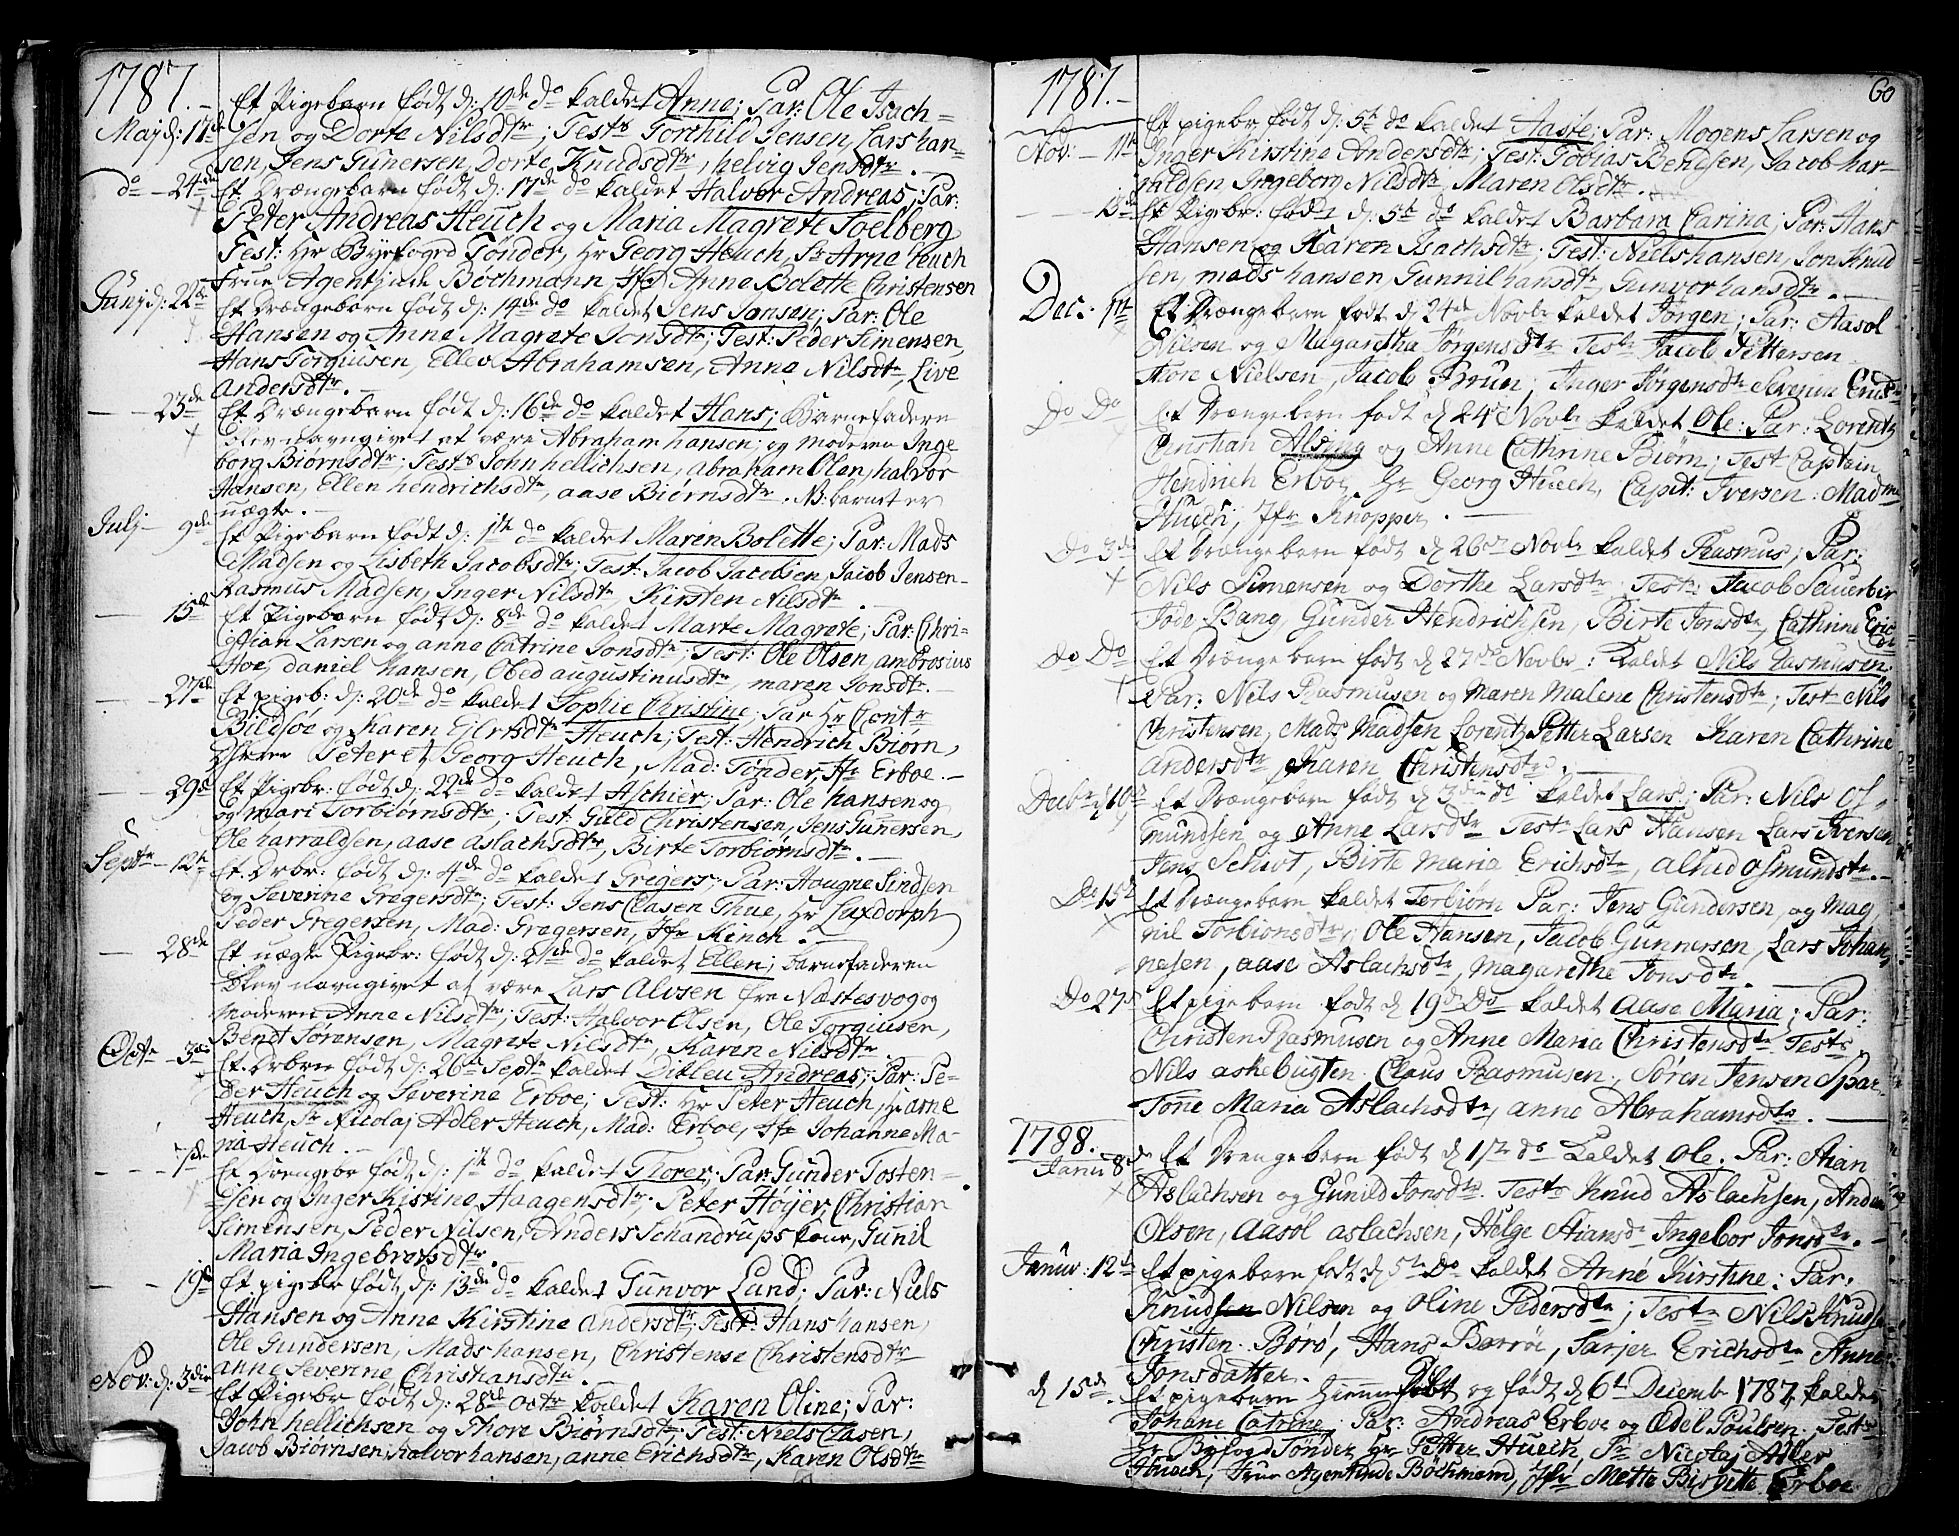 SAKO, Kragerø kirkebøker, F/Fa/L0002: Ministerialbok nr. 2, 1767-1802, s. 60